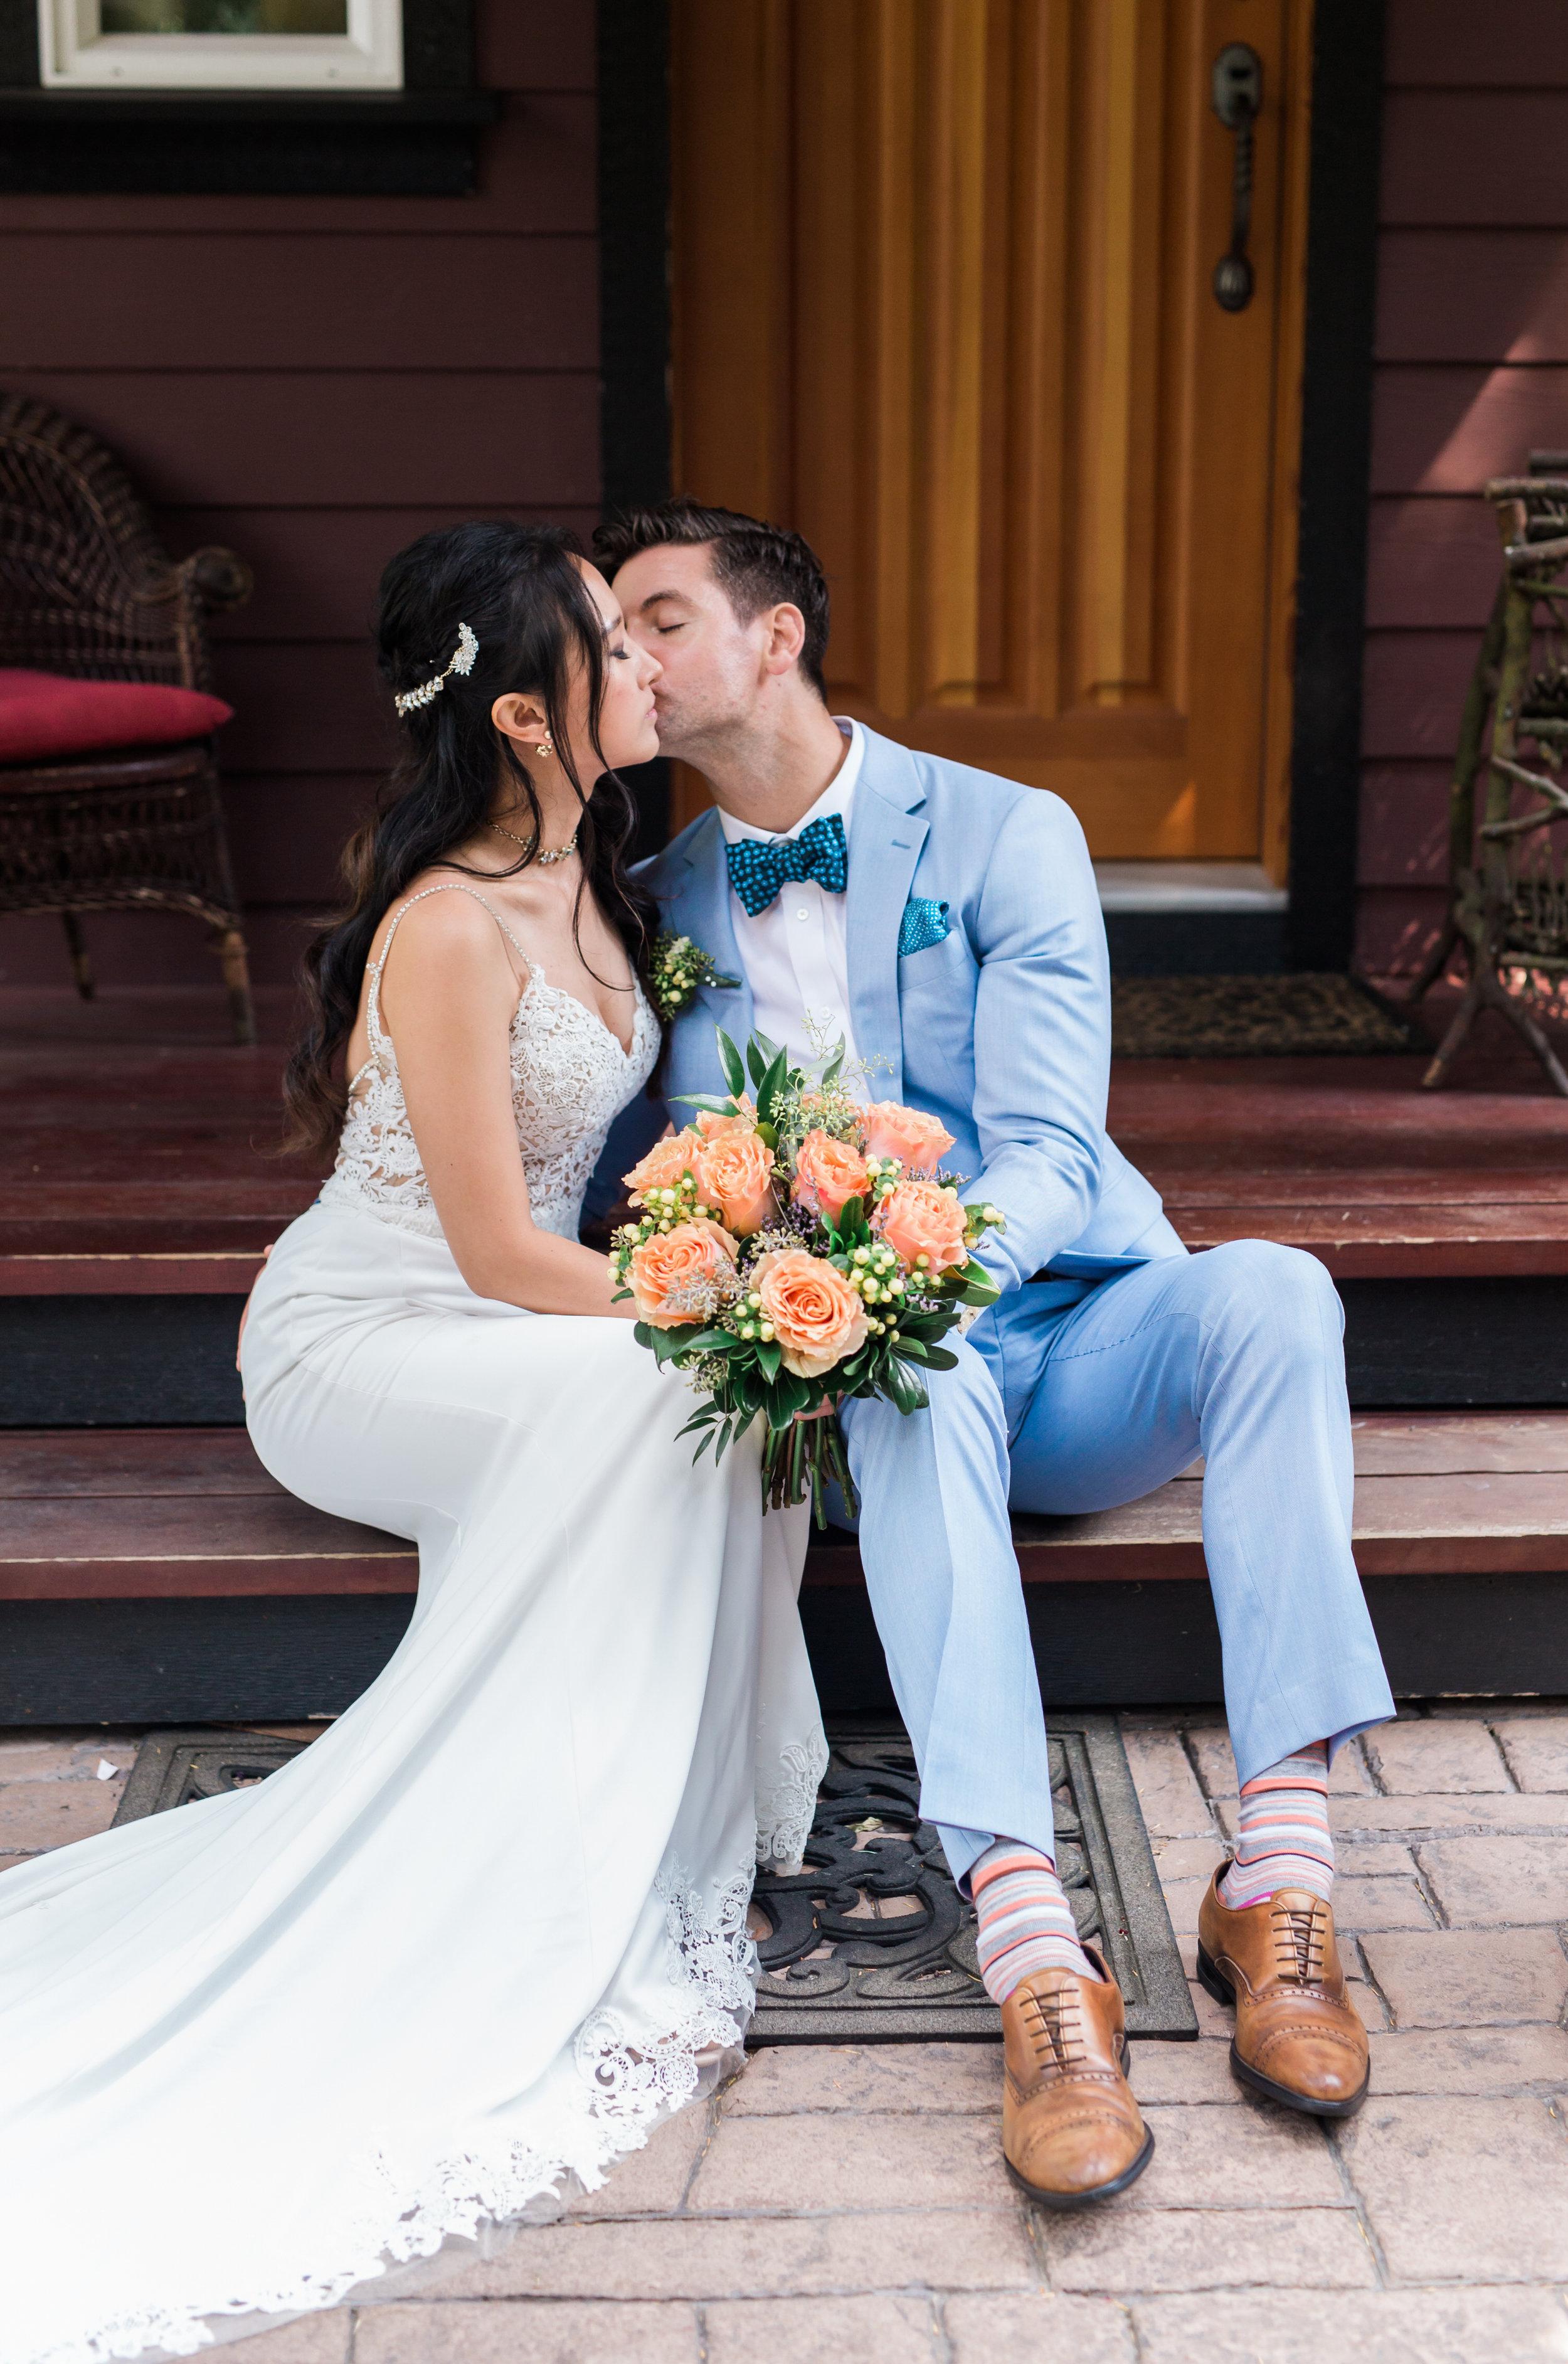 Linwood House Wedding Photos - Roberts Creek Wedding Photos - Vancouver Wedding Photographer & Videographer - Sunshine Coast Wedding Photos - Sunshine Coast Wedding Photographer - Jennifer Picard Photography - IMG_7898.jpg